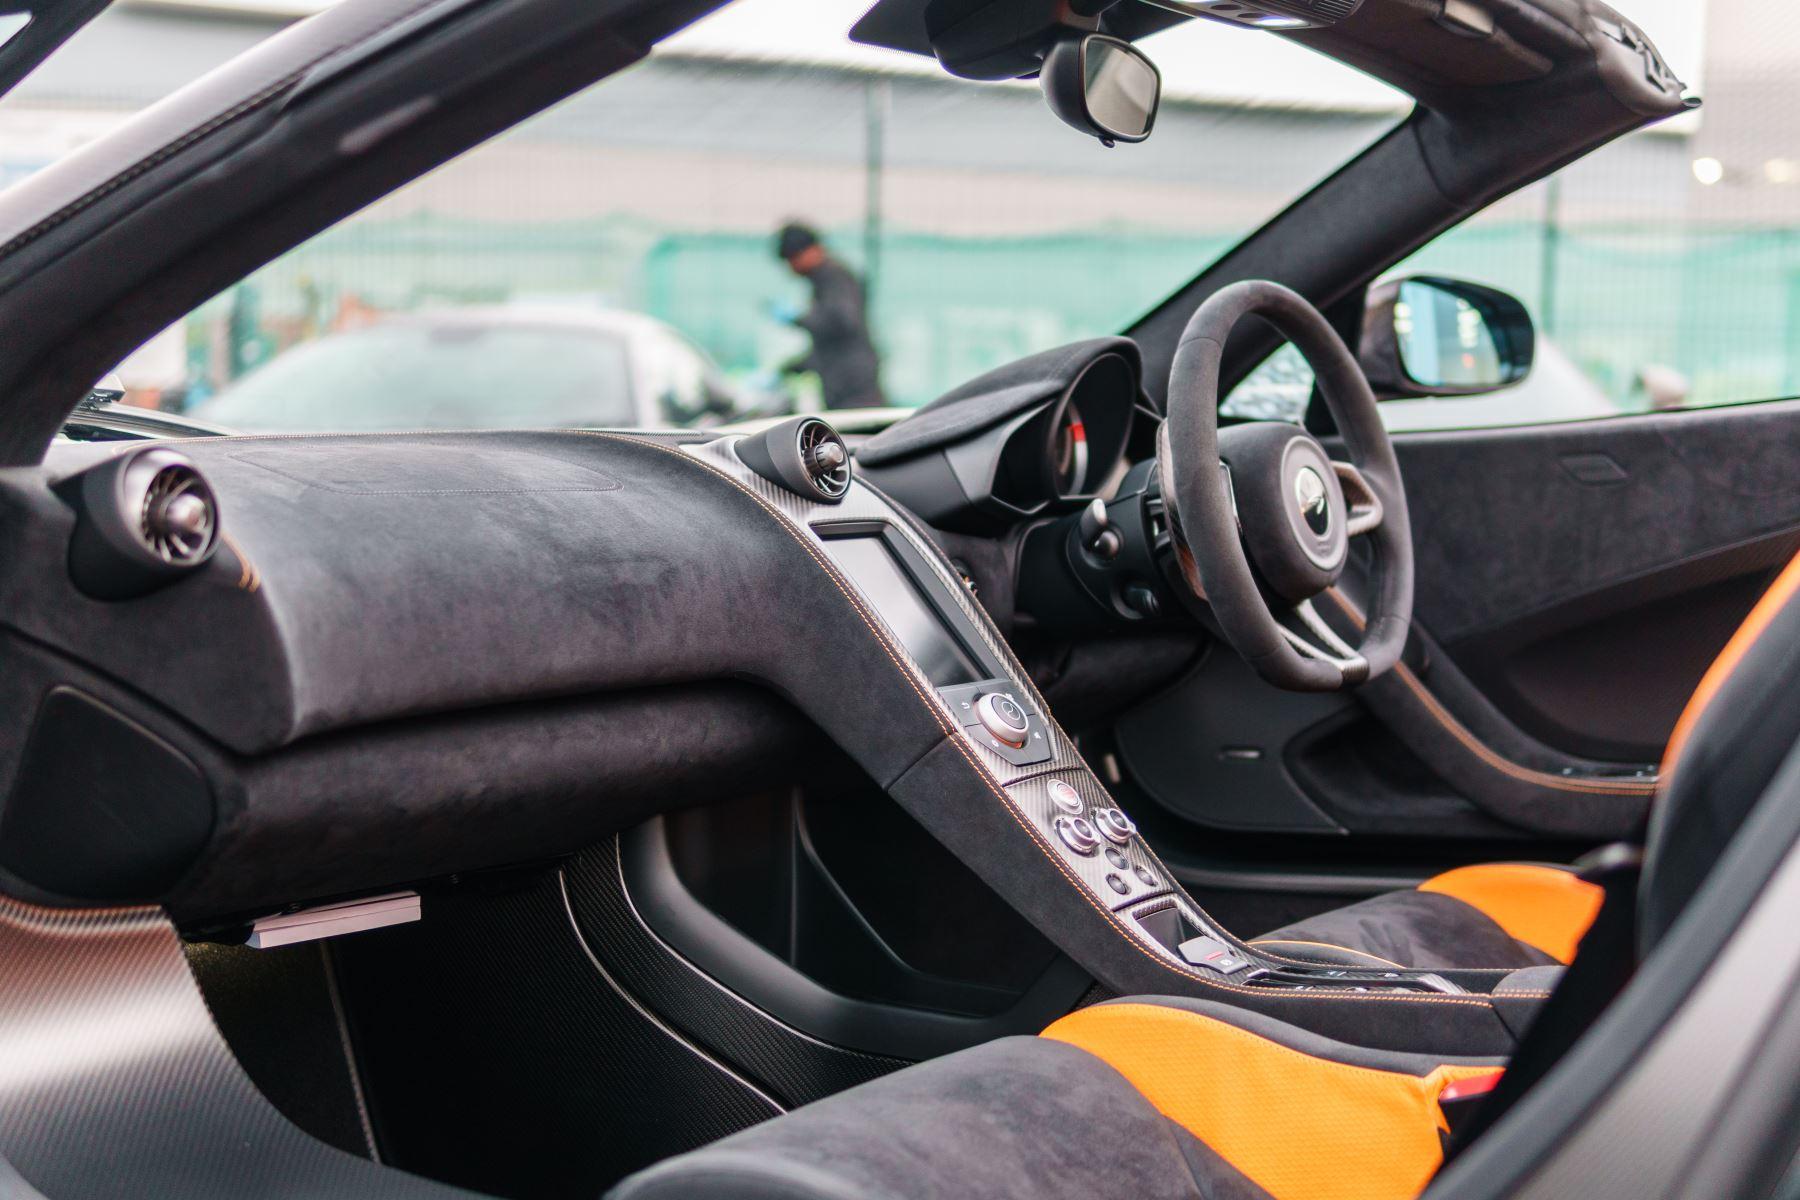 McLaren 675LT Spider MSO Carbon Series image 54